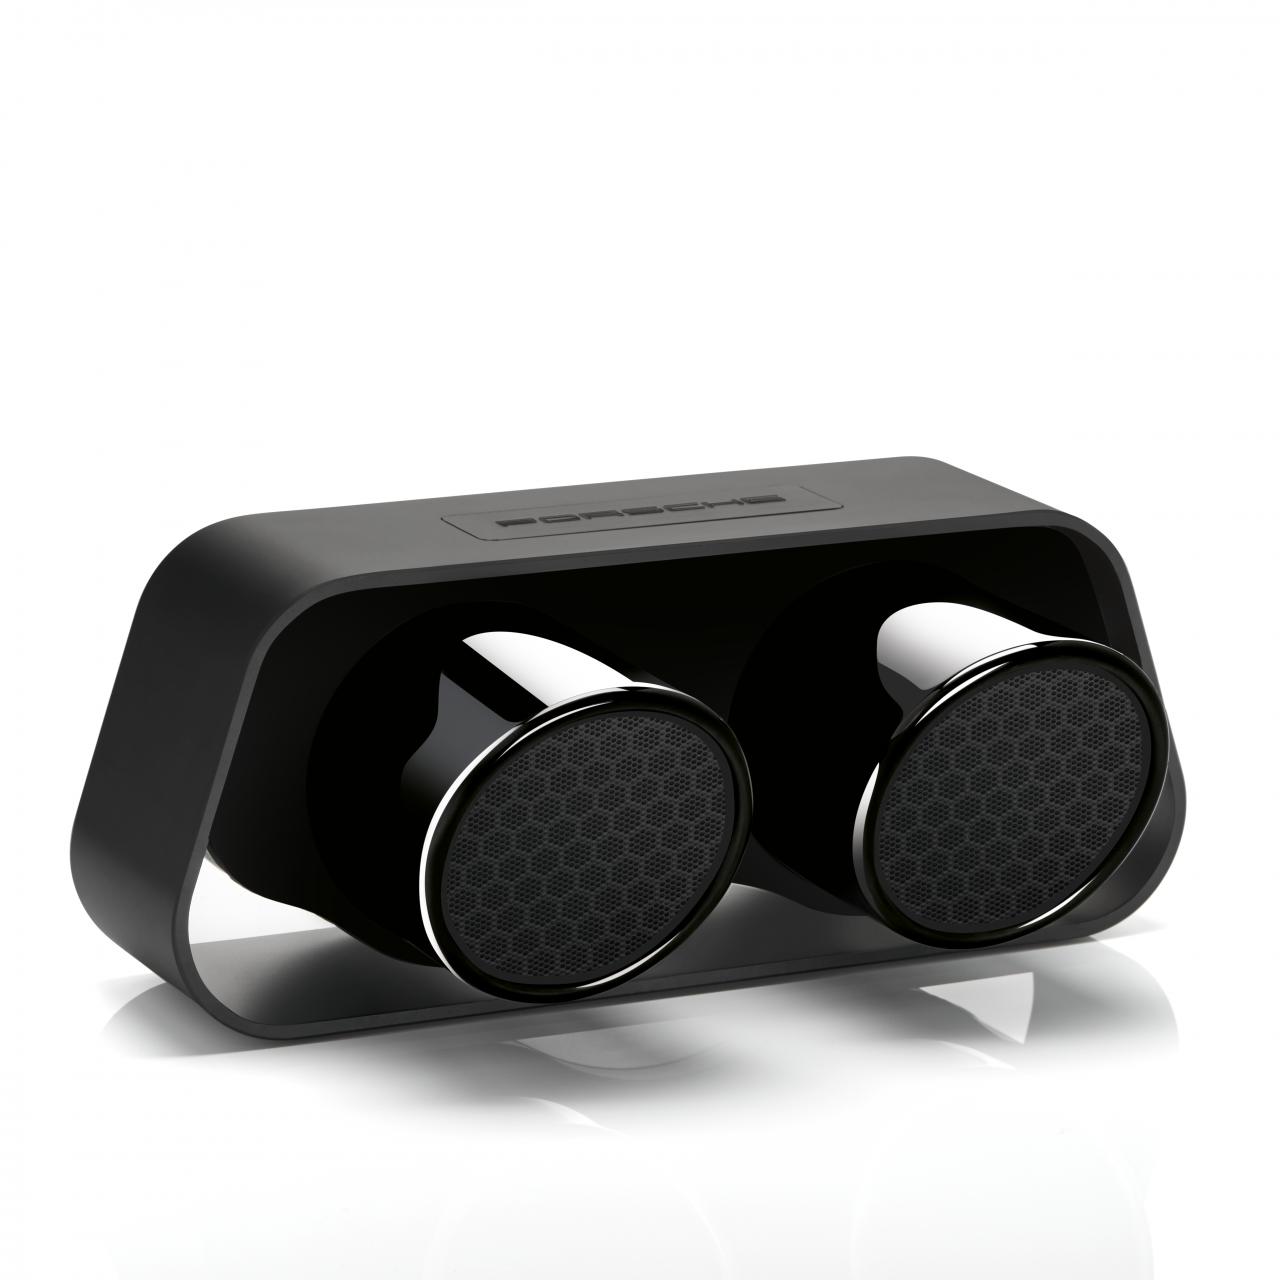 Porsche Design Uses 911 Gt3 Exhaust For Bluetooth Speaker